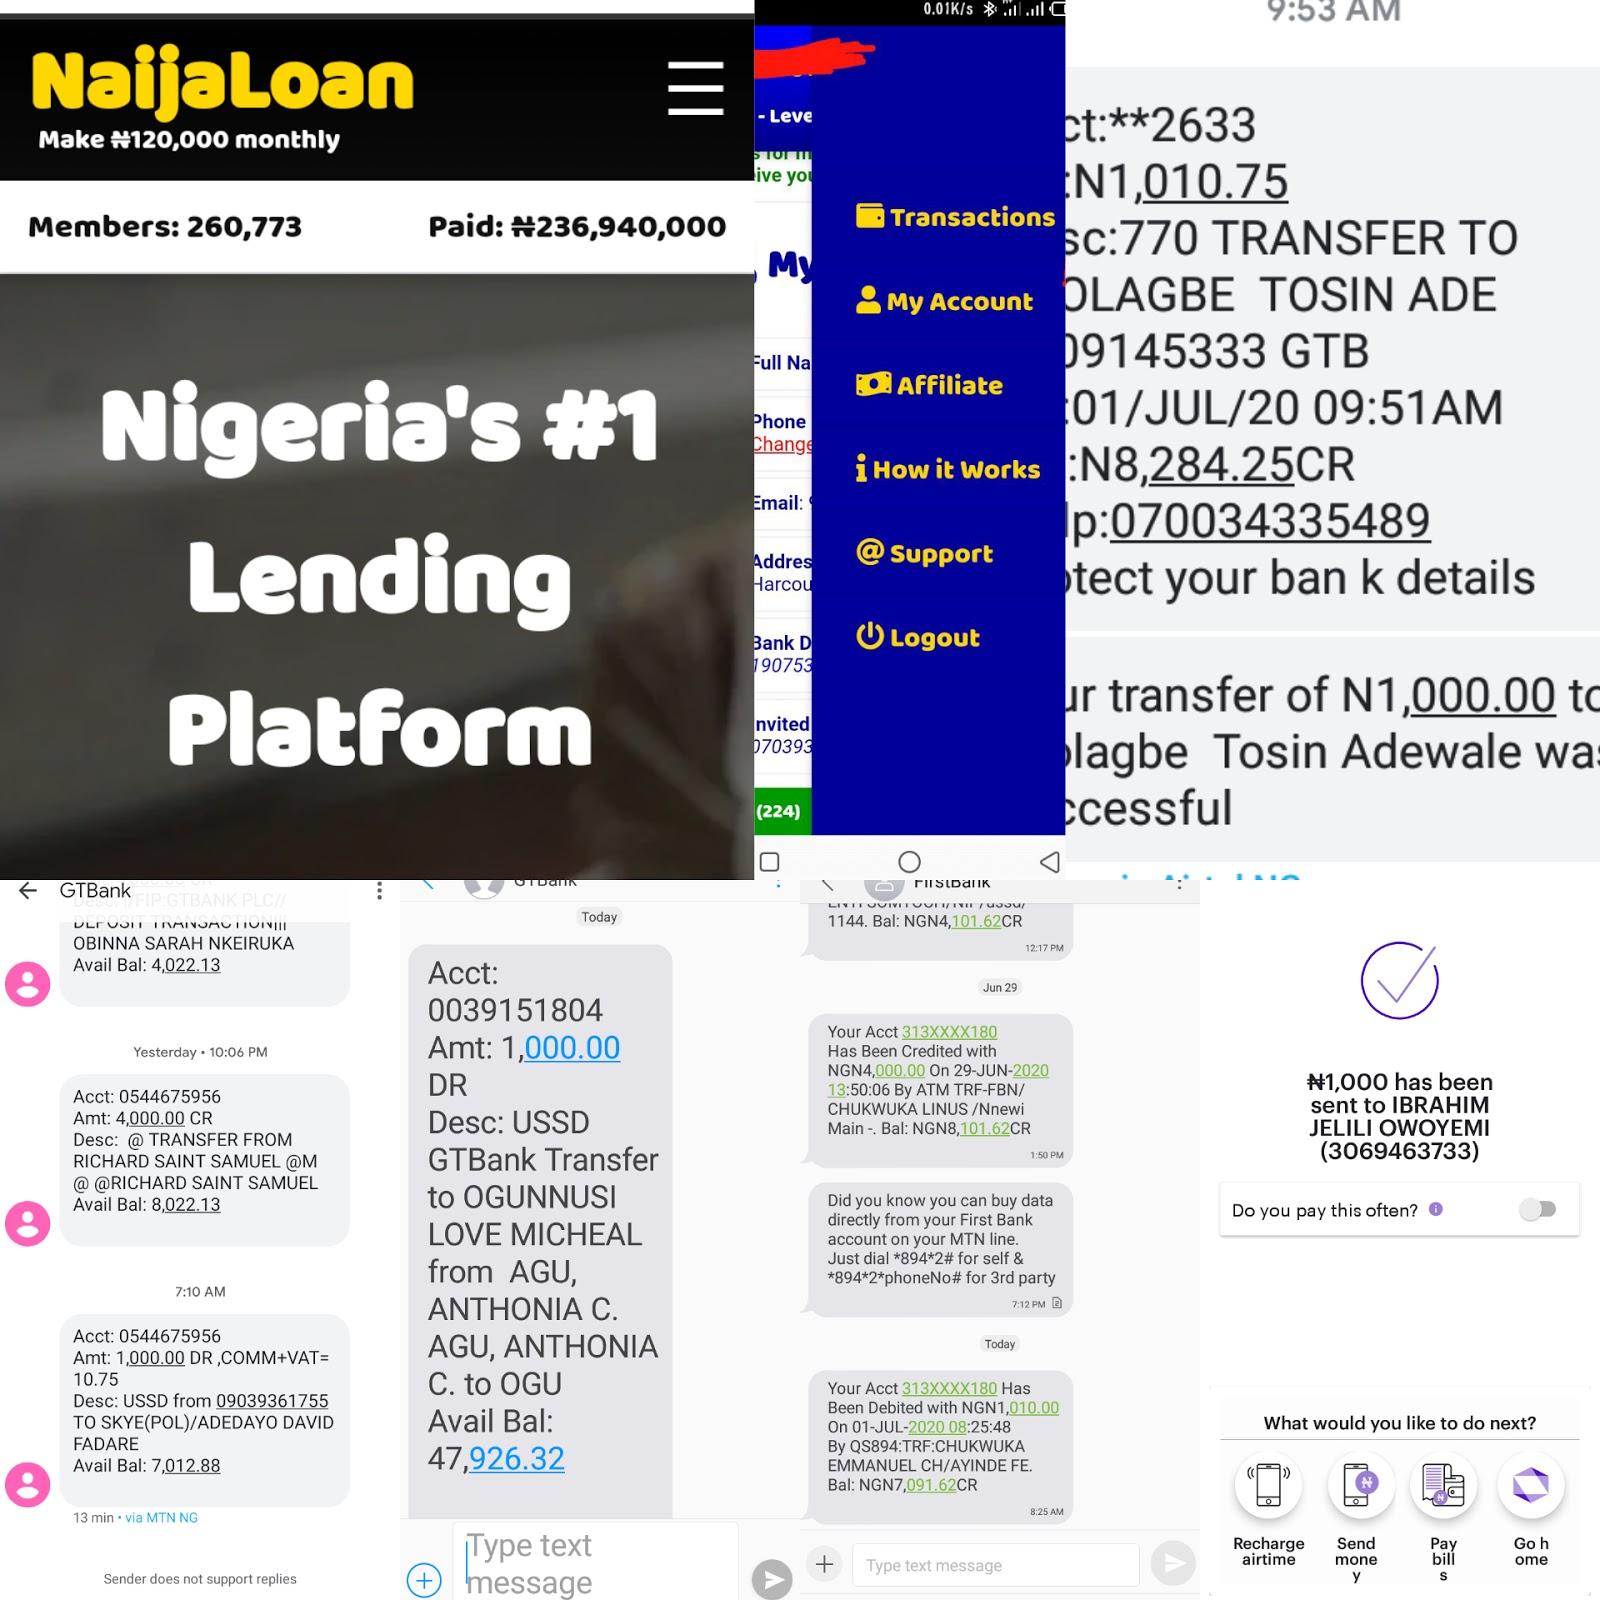 How to create account on Naijaloan - Make money with Naijaloan - All you should know about Naijaloan #Arewapublisize